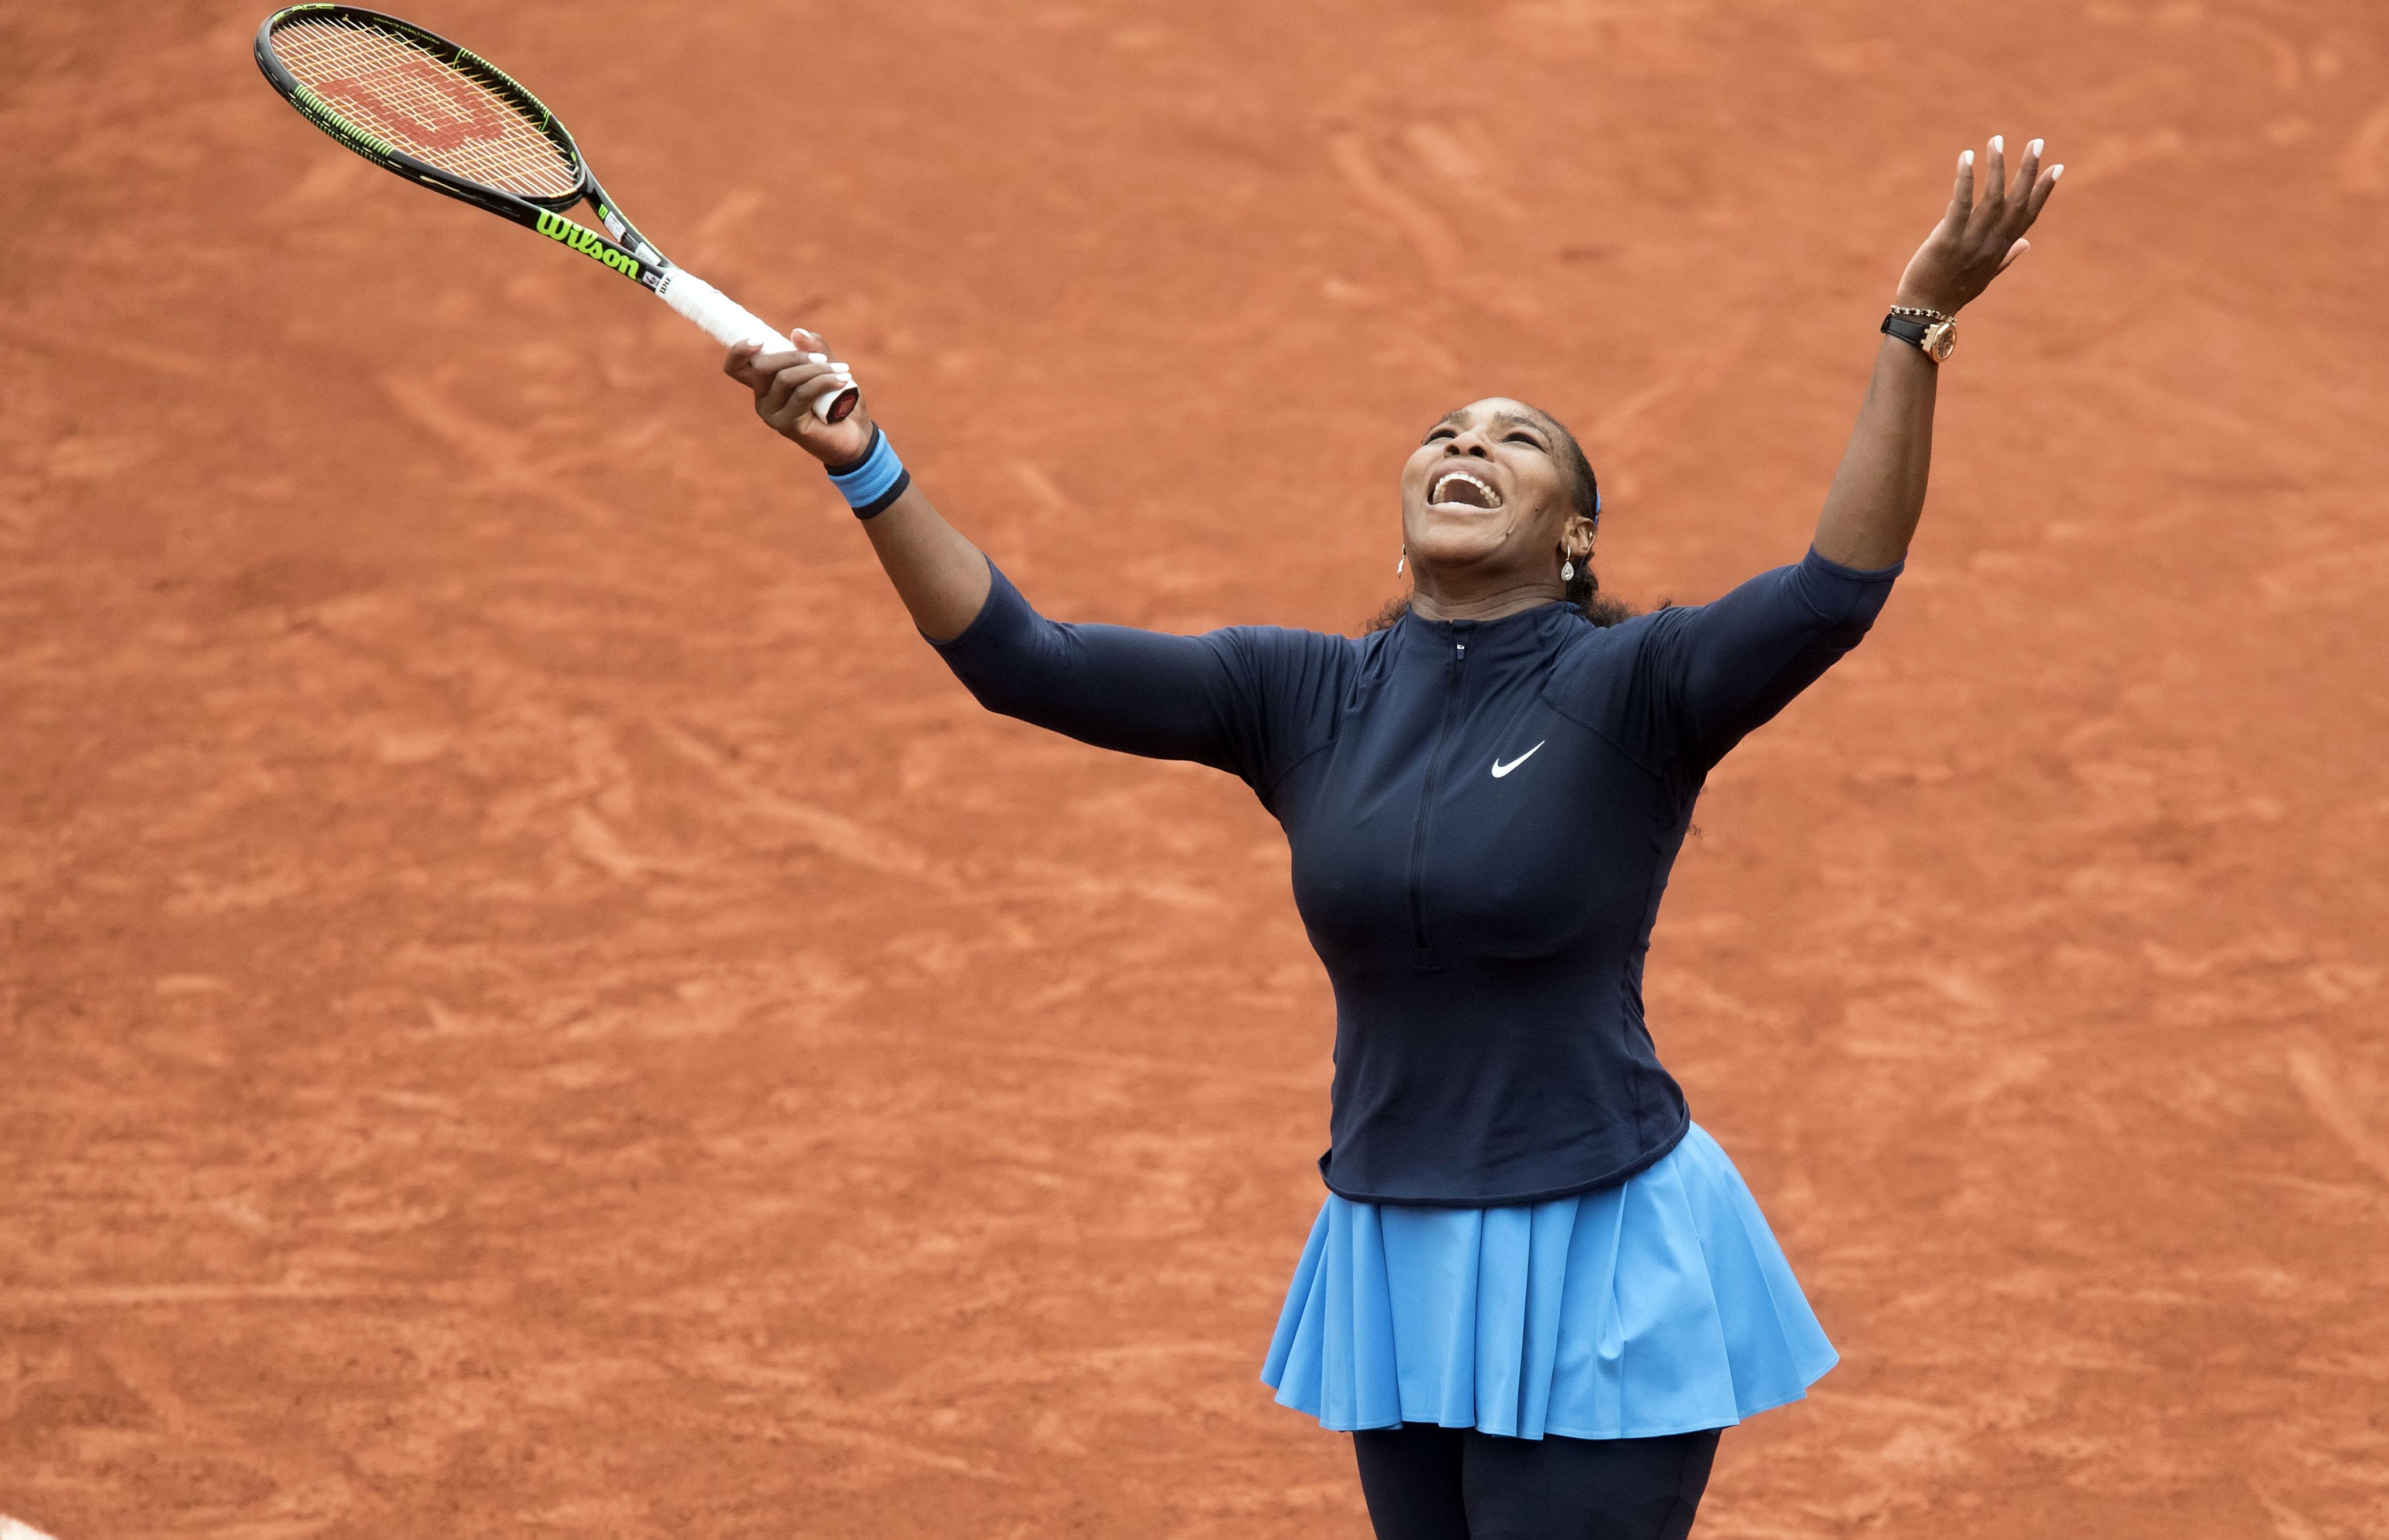 Tennis on Yahoo! Sports - Sports News, Scores, Fantasy Games